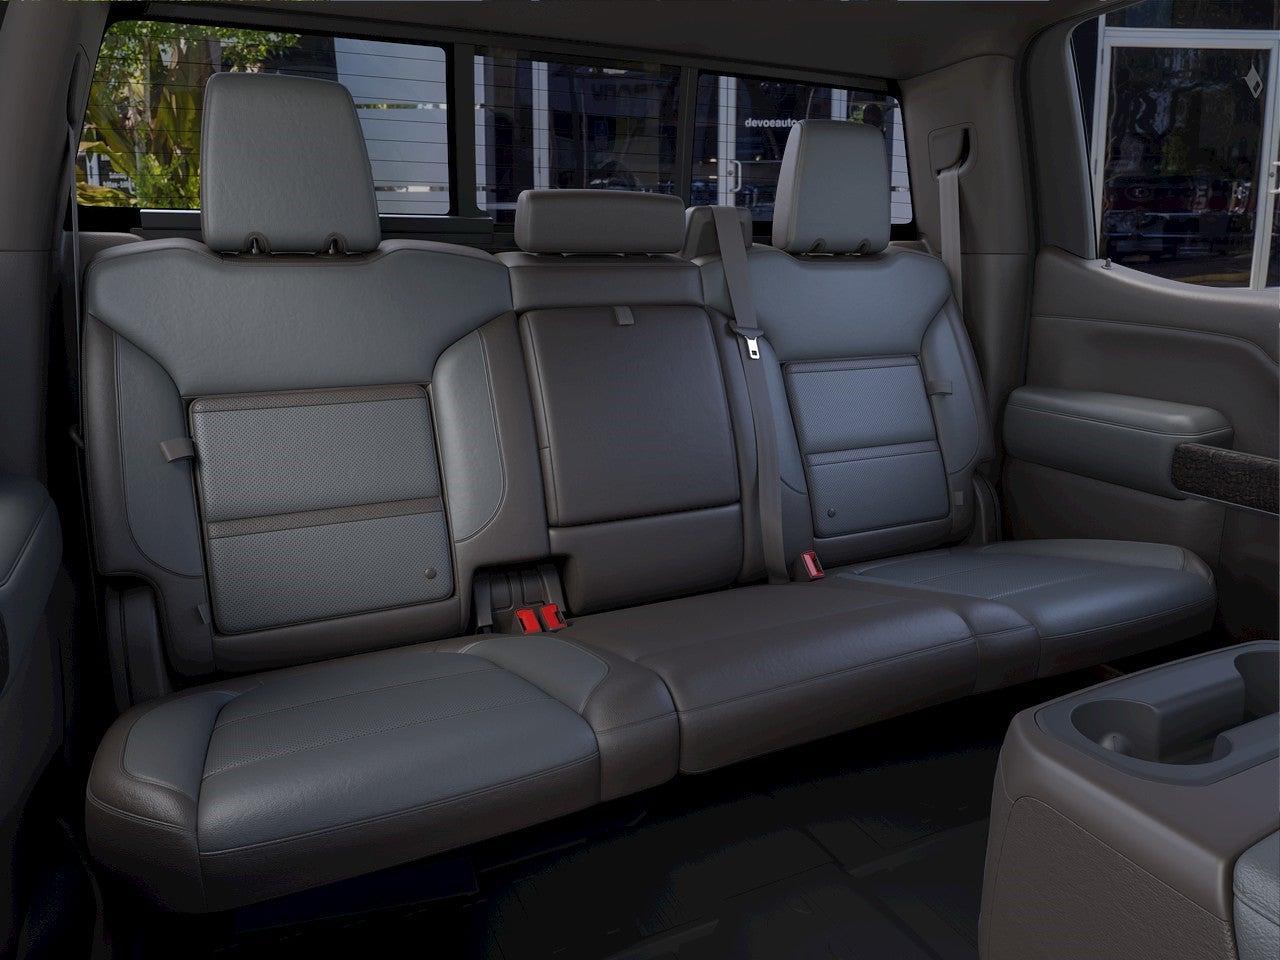 2021 GMC Sierra 1500 Crew Cab 4x4, Pickup #T21362 - photo 16